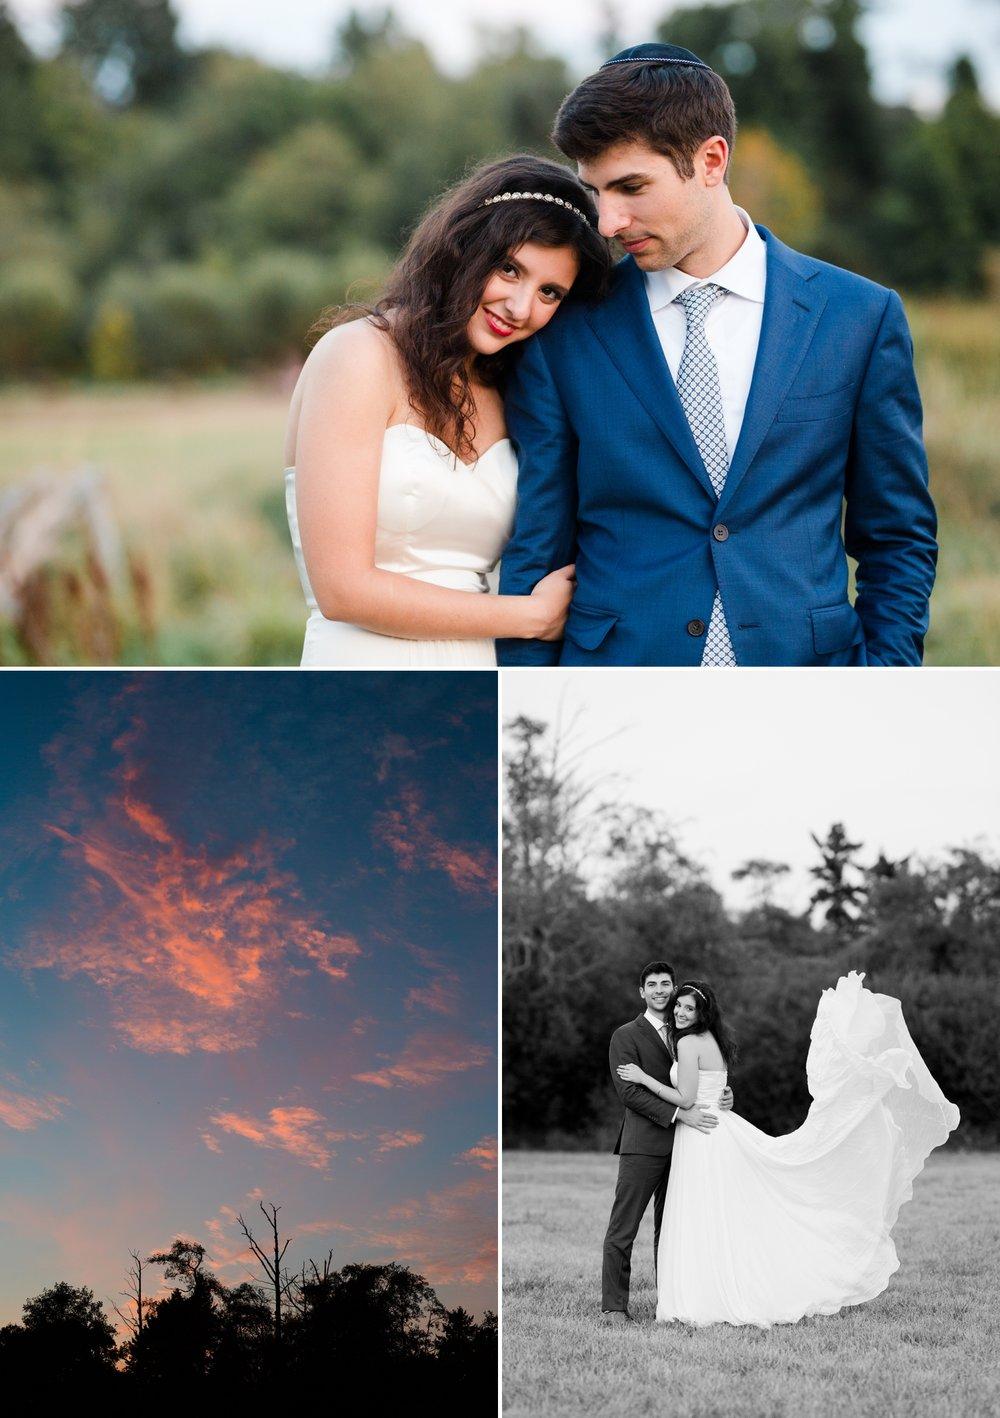 20-wedding-sunset-portraits-cove-normandy-park.jpg